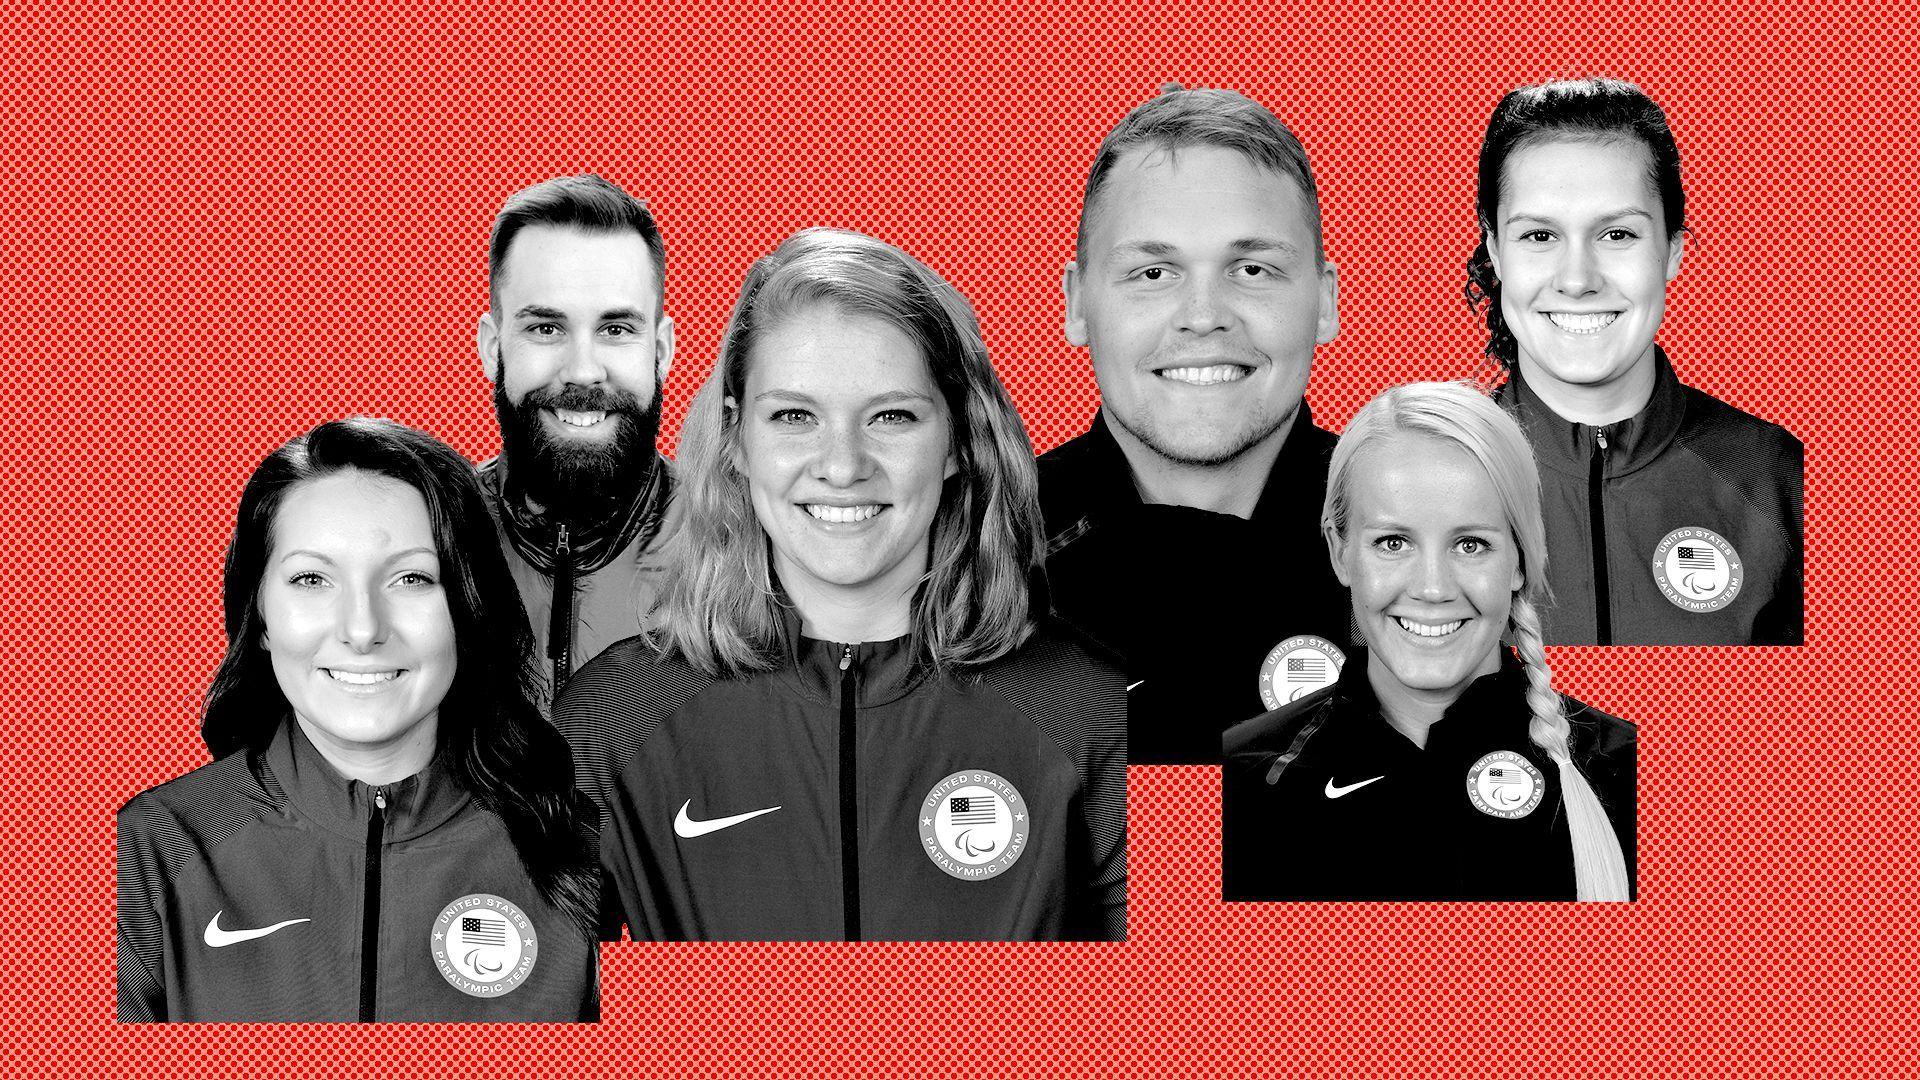 Photo illustration of six Paralympians from Minnesota